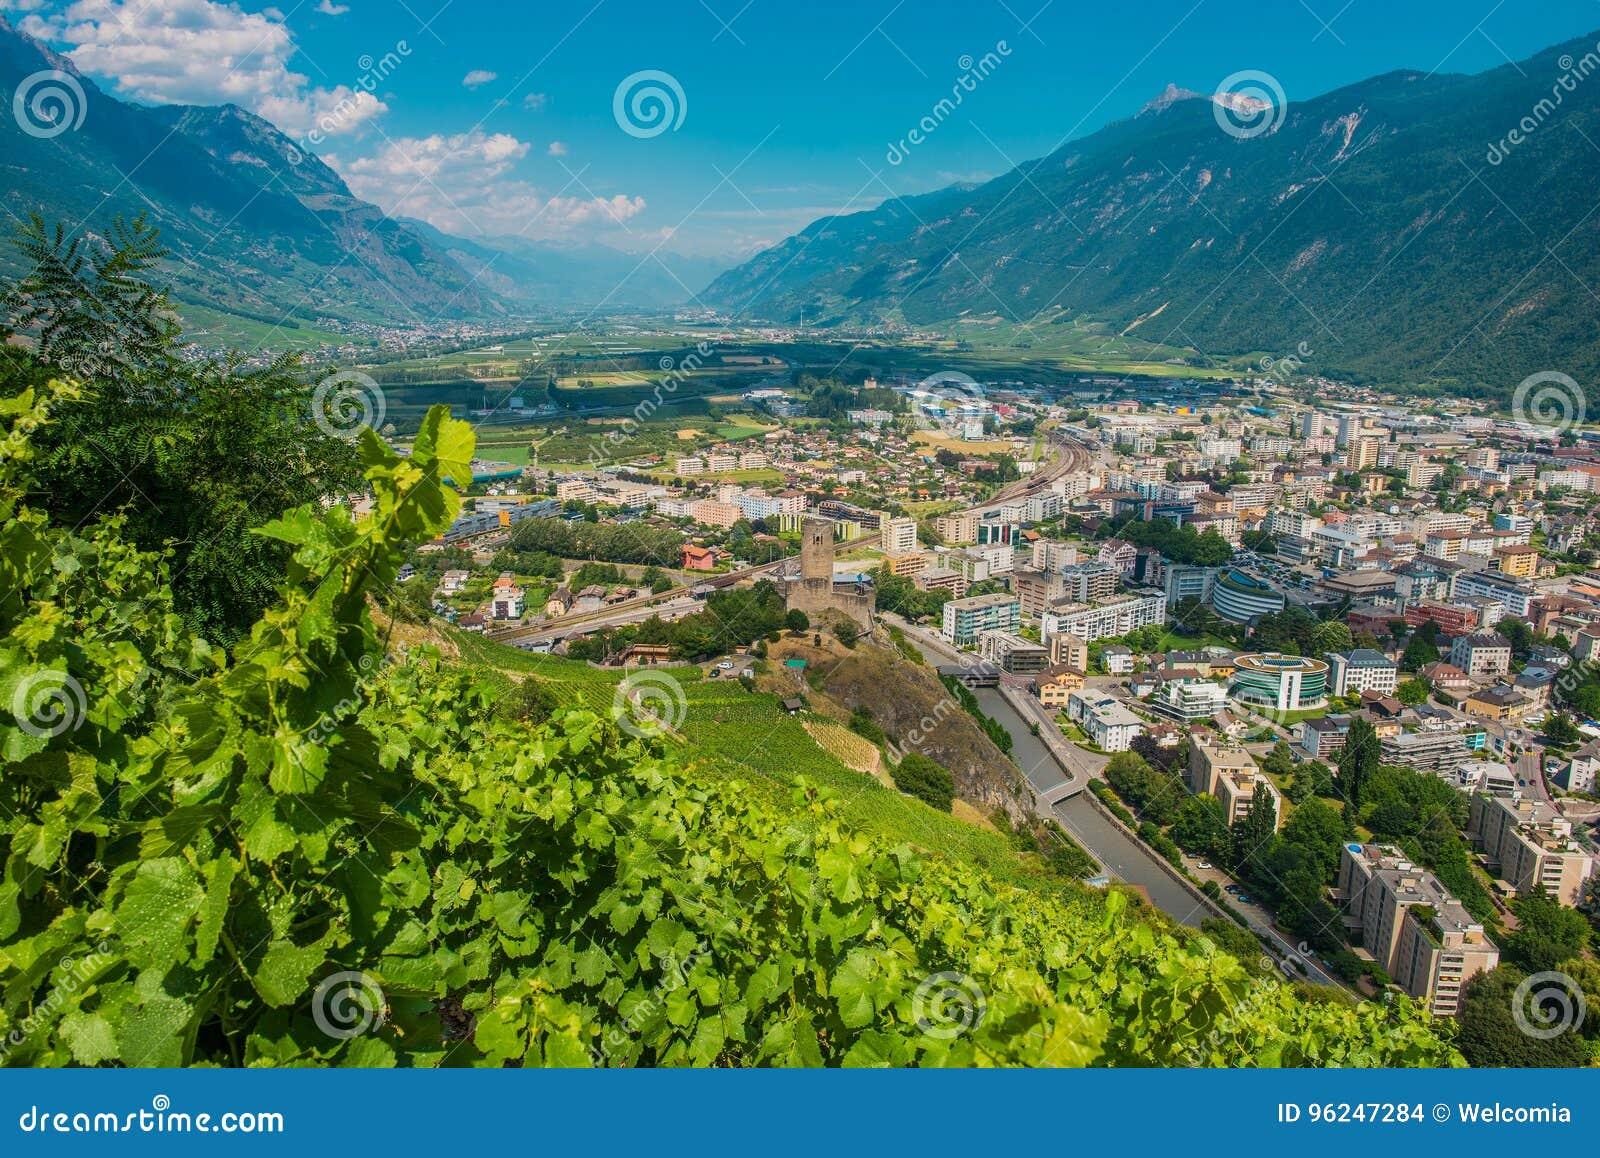 City Of Martigny Switzerland Stock Photo Image of cityscape plant